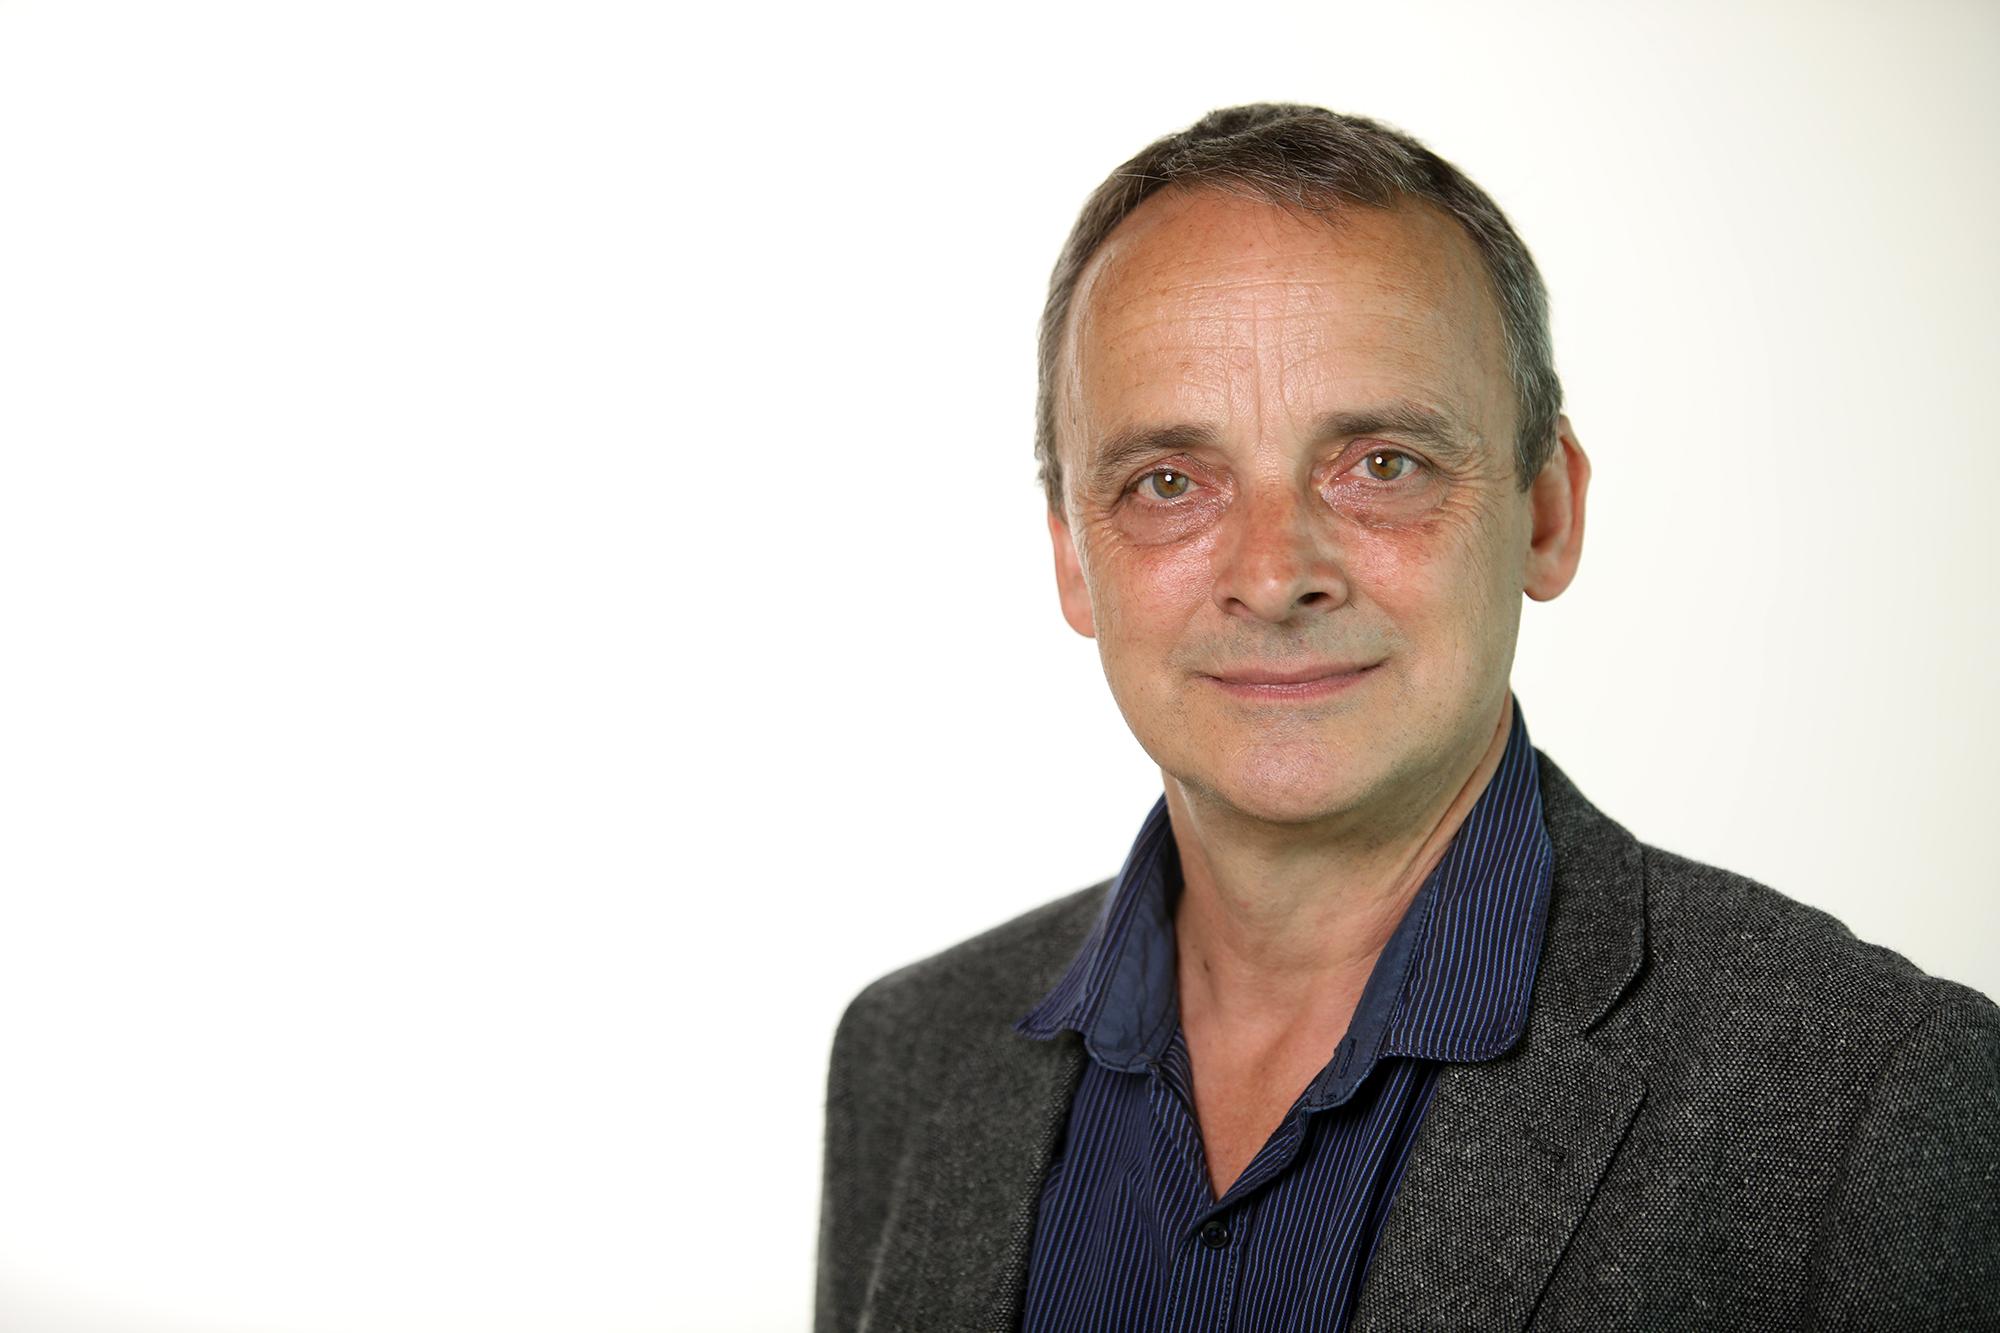 Joe Townsend headshot